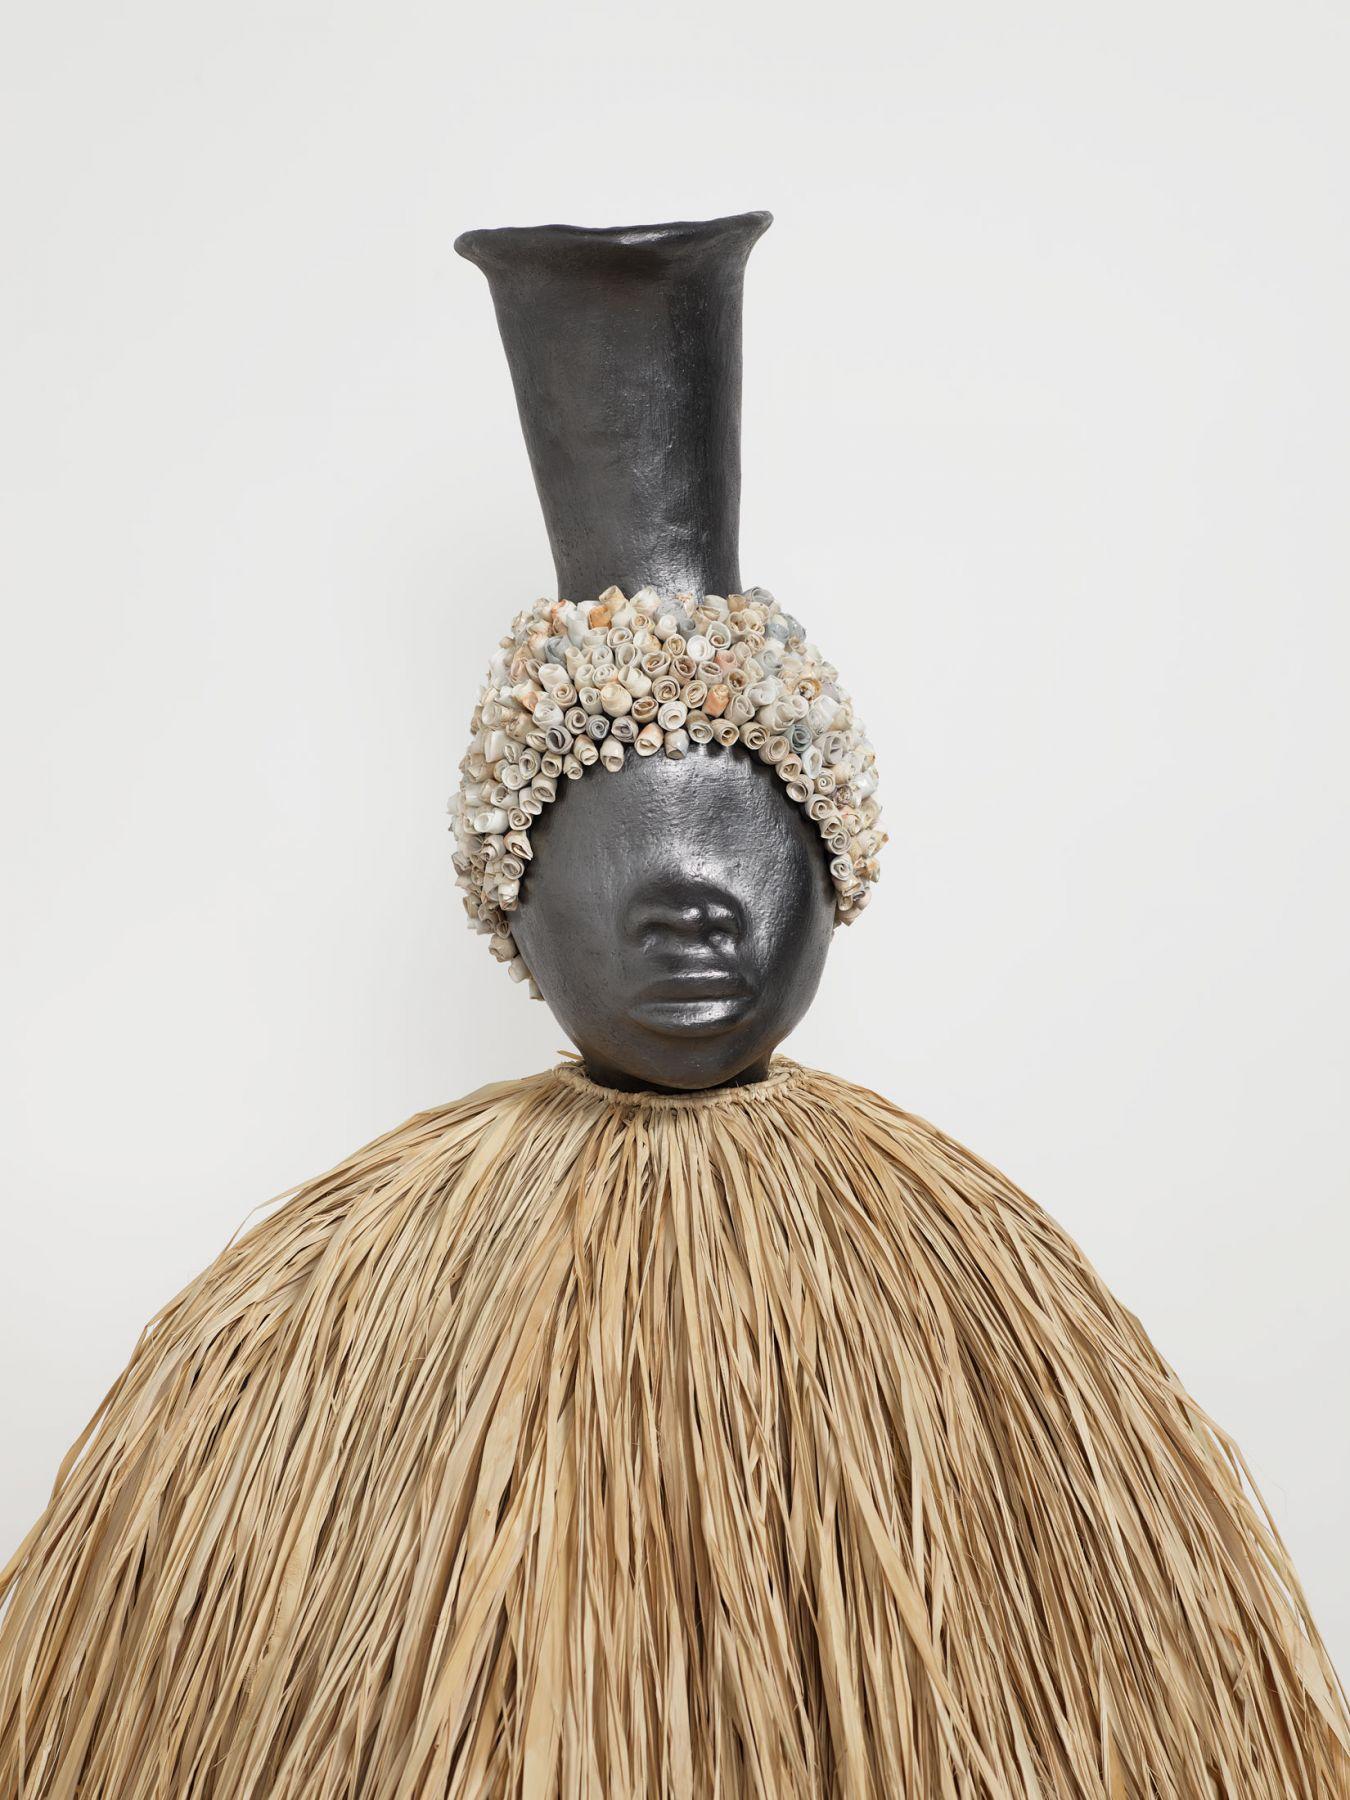 Simone Leigh, Figure with Skirt (Face Jug Series), 2018